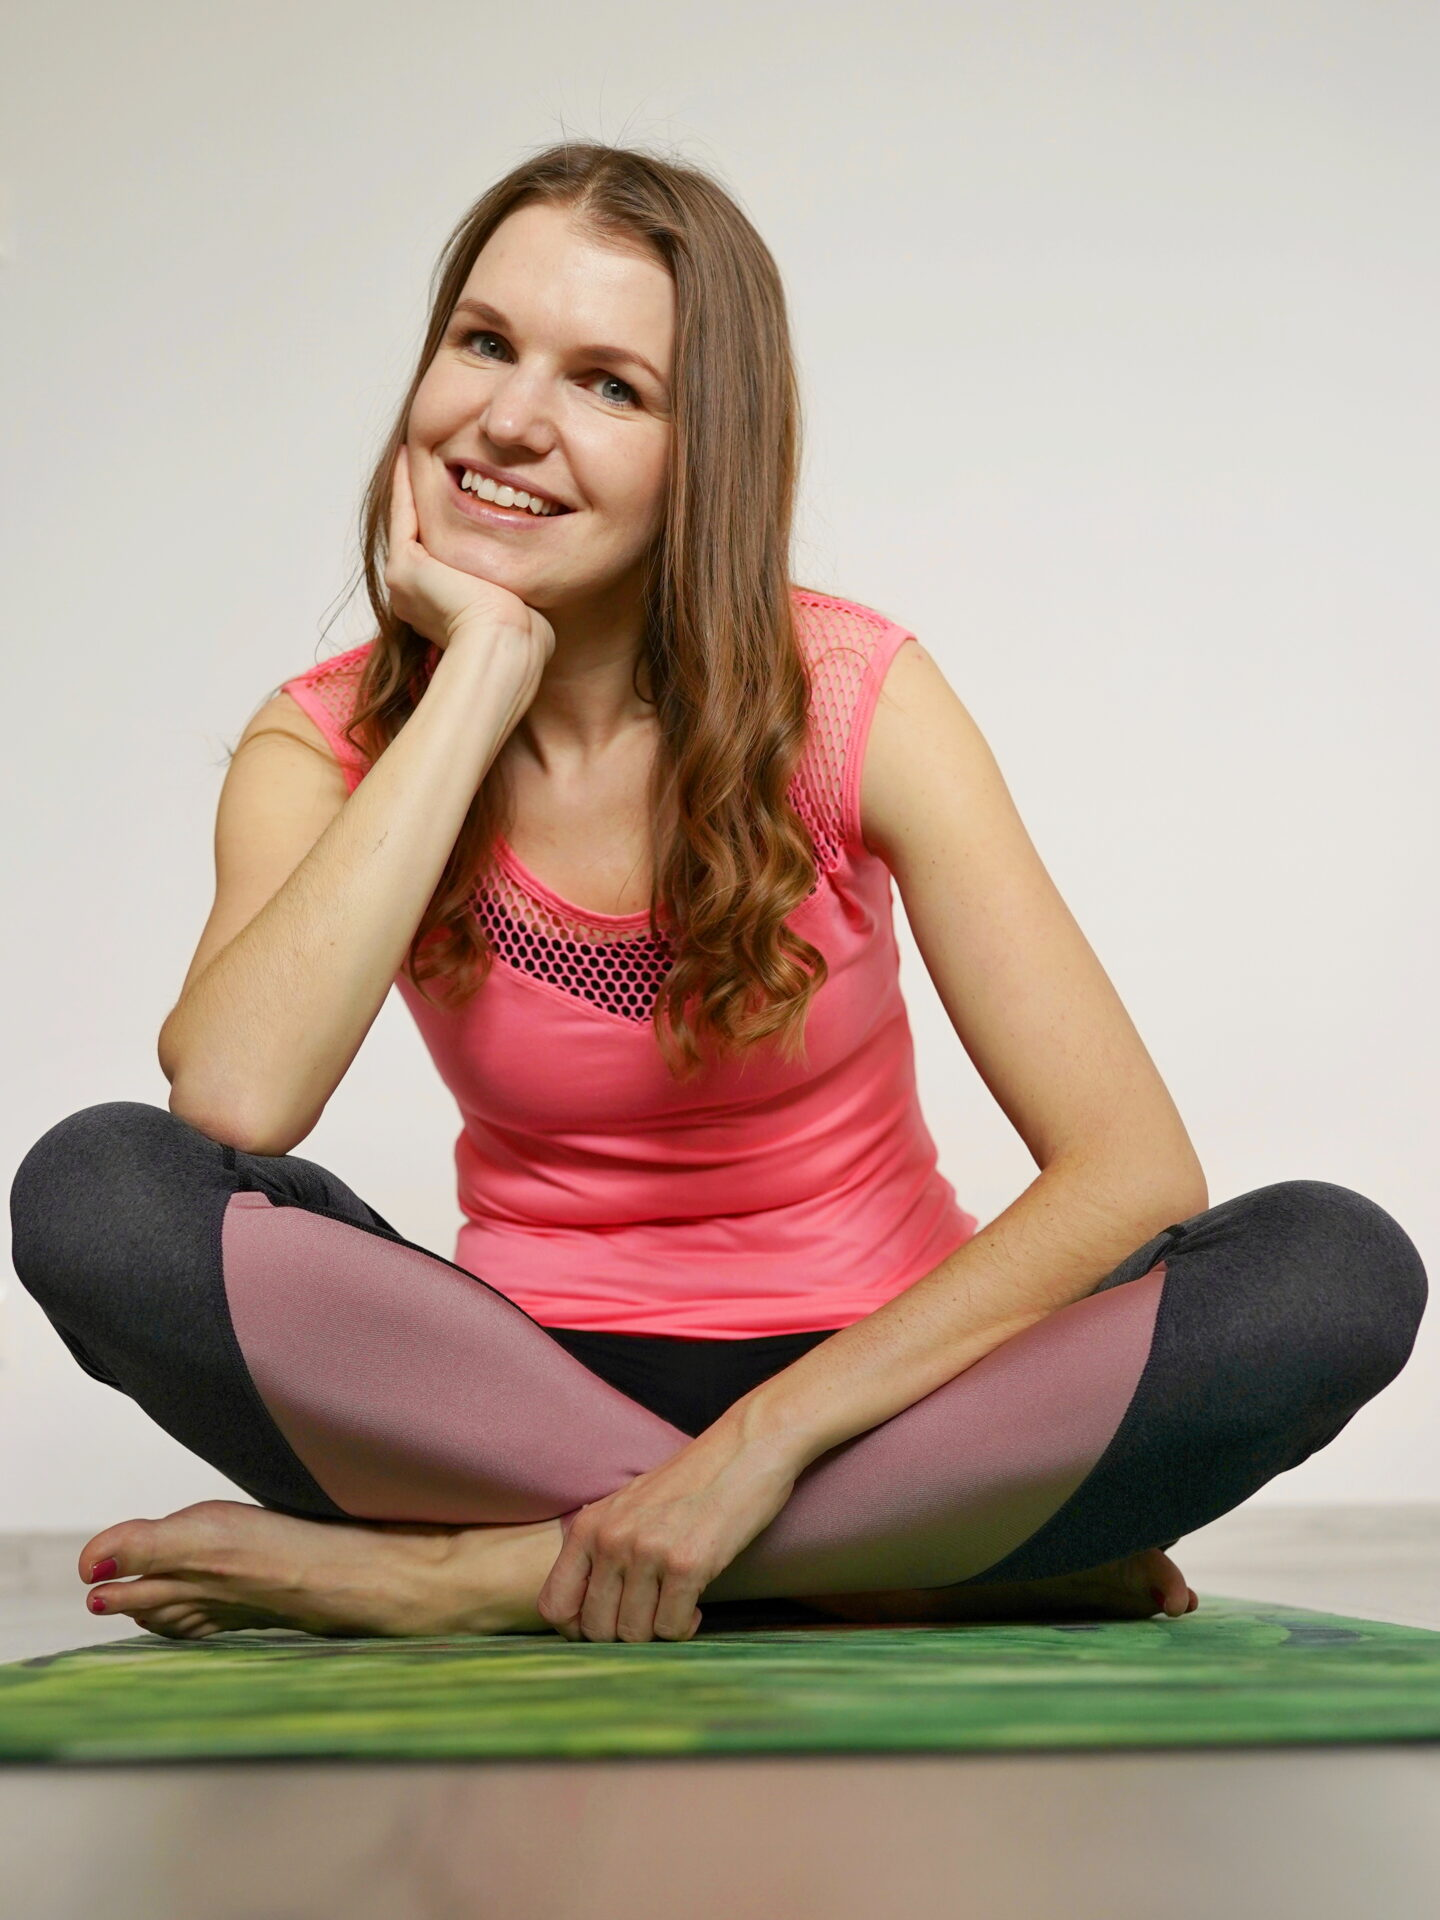 Tipy na účty s cvičením